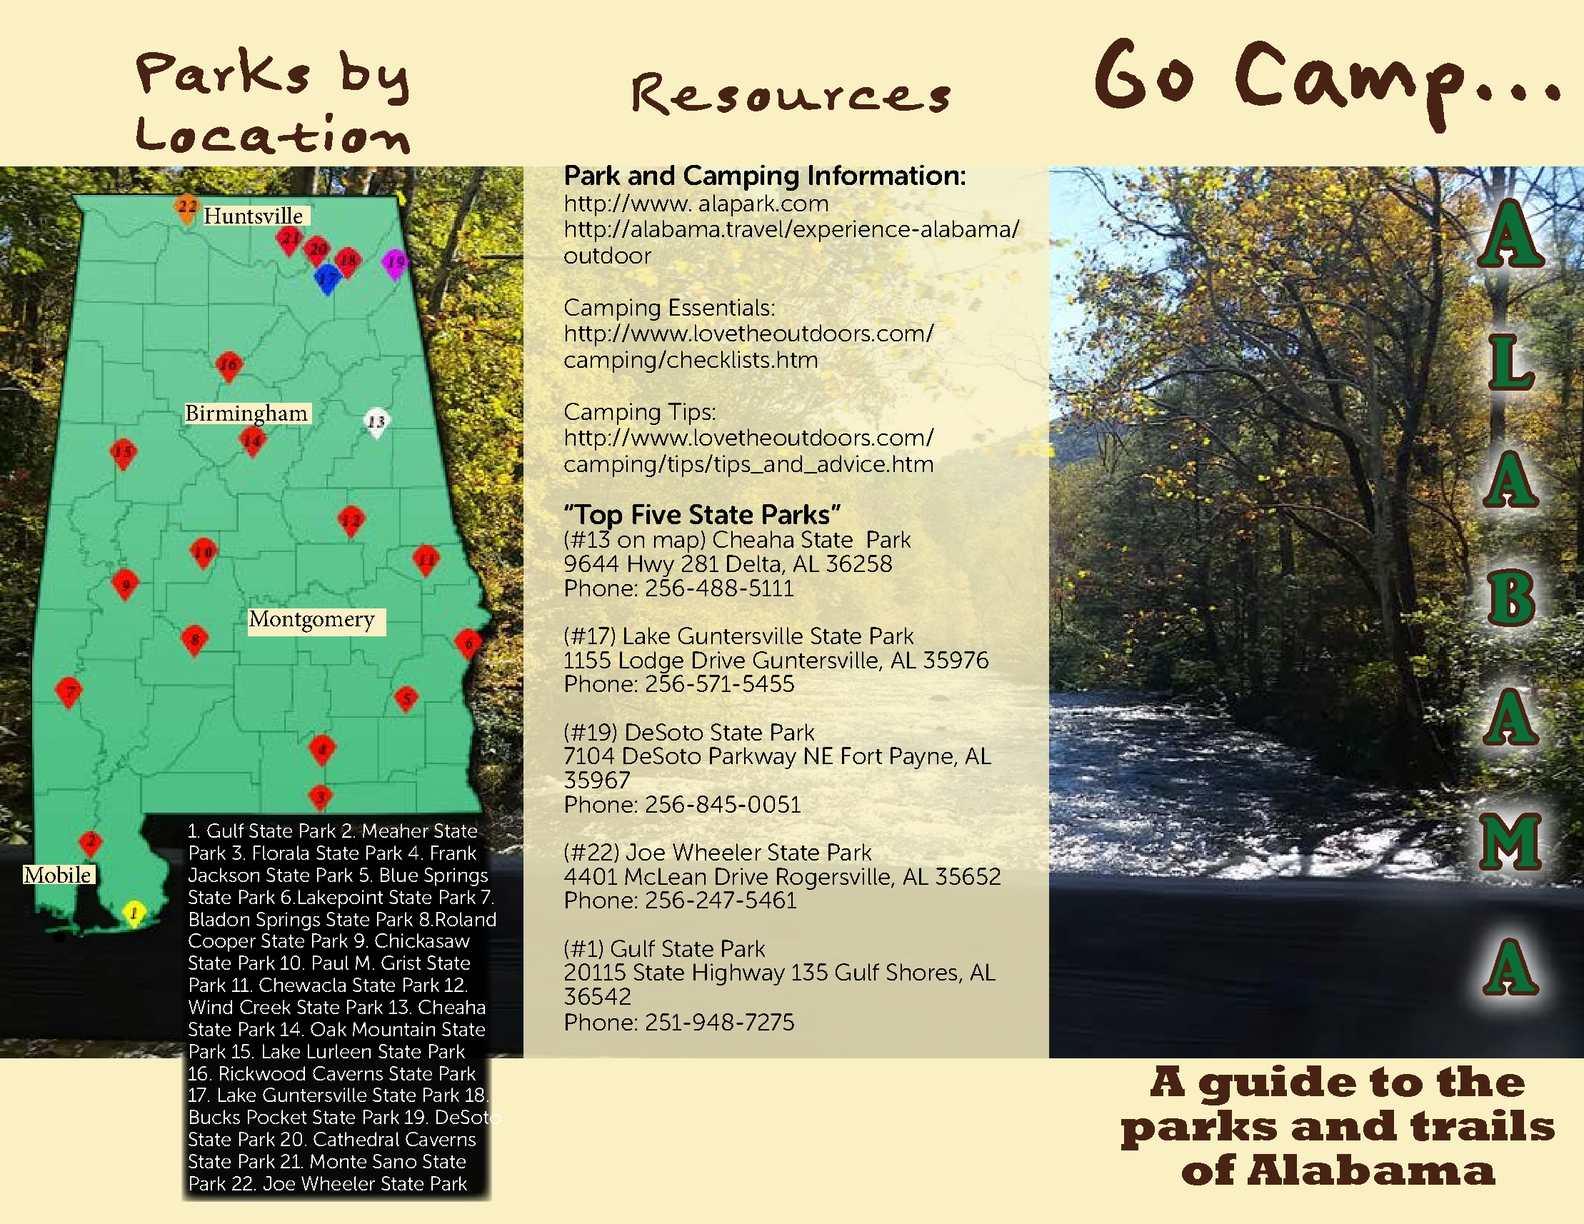 Calaméo - Go Camp Alabama brochure